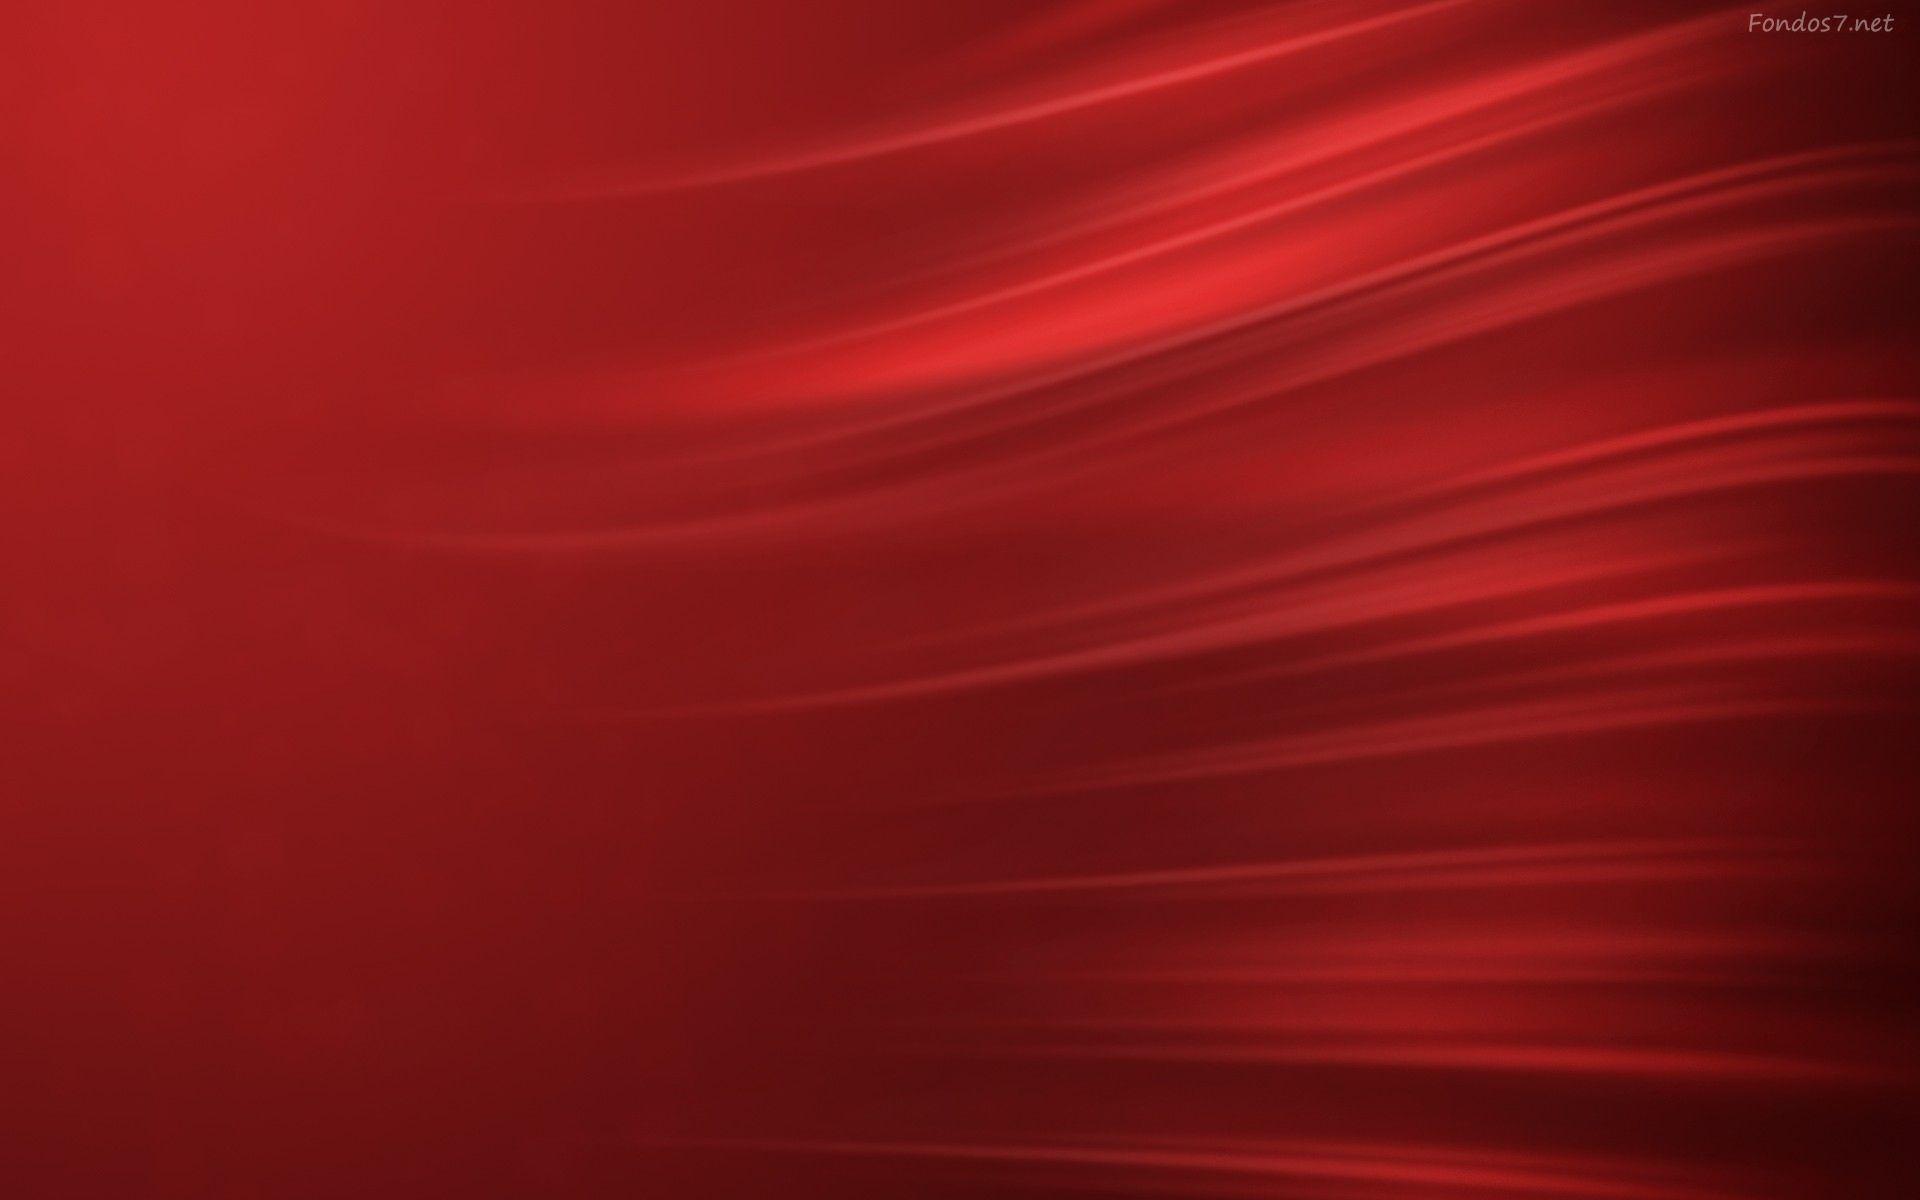 Fondo De Pantalla Abstracto Barras De Colores: Fondos Abstractos Rojos Para Fondo Celular En Hd 36 HD